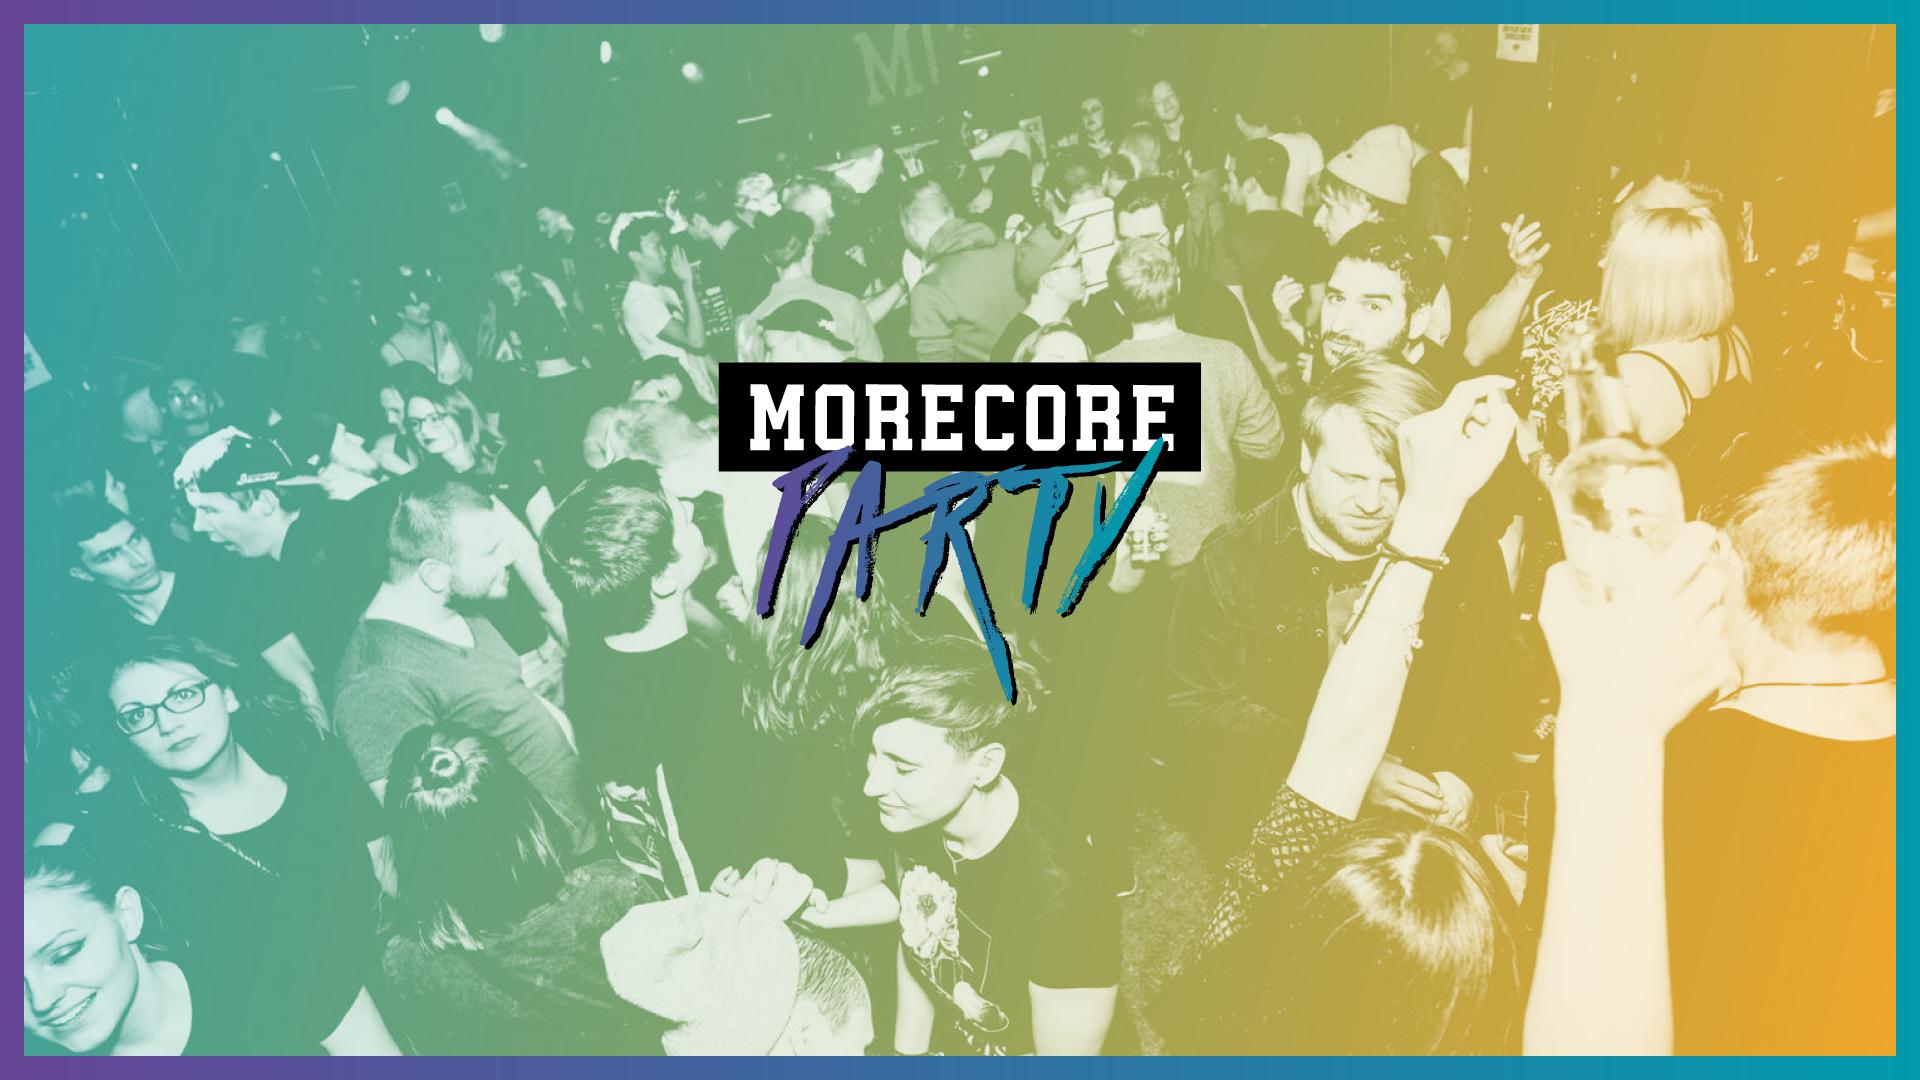 MoreCore Party Frankfurt